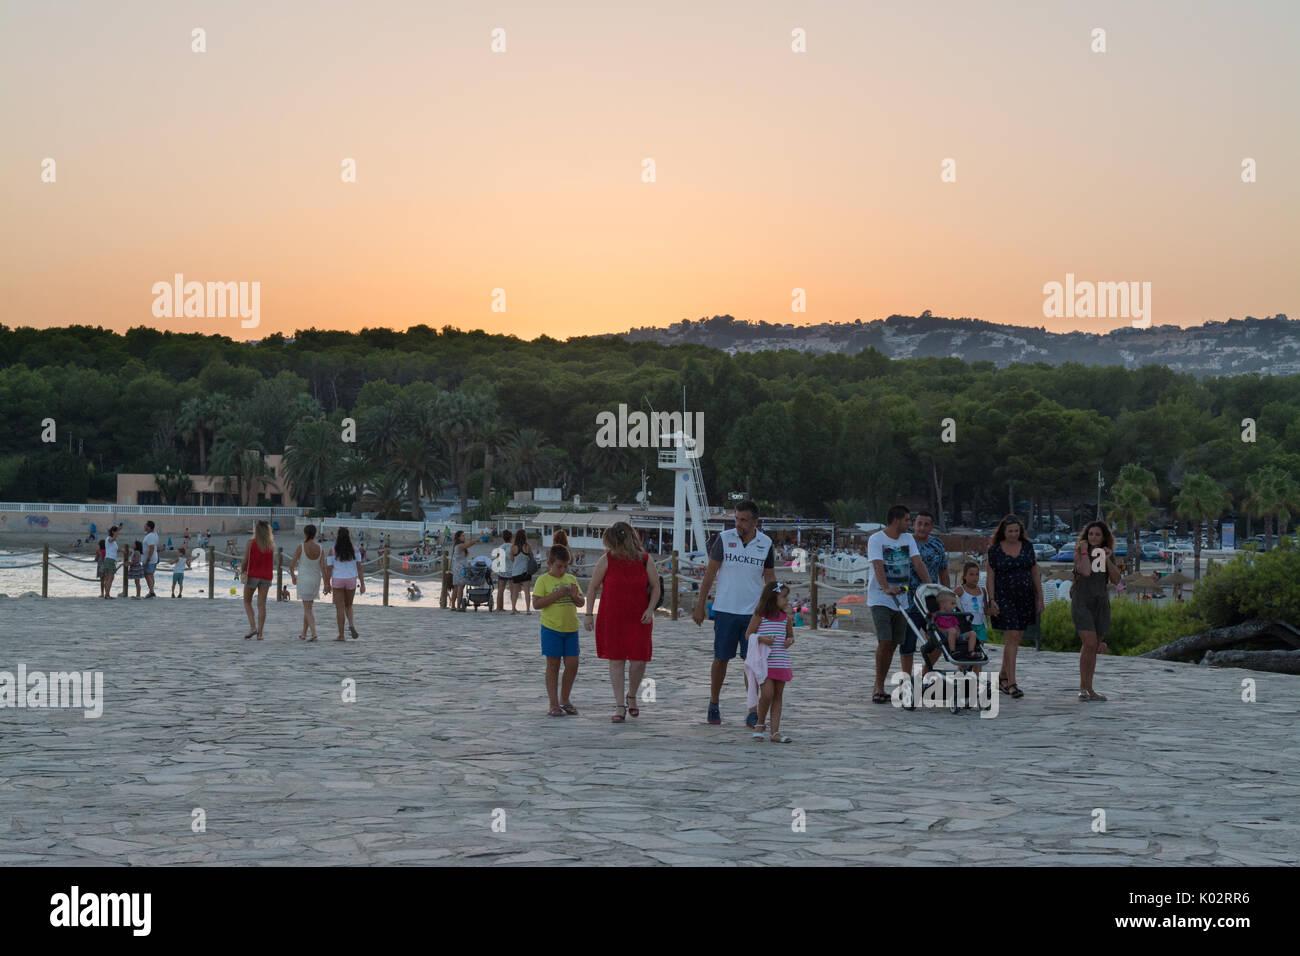 Moraira promenade - families strolling at sunset - Stock Image